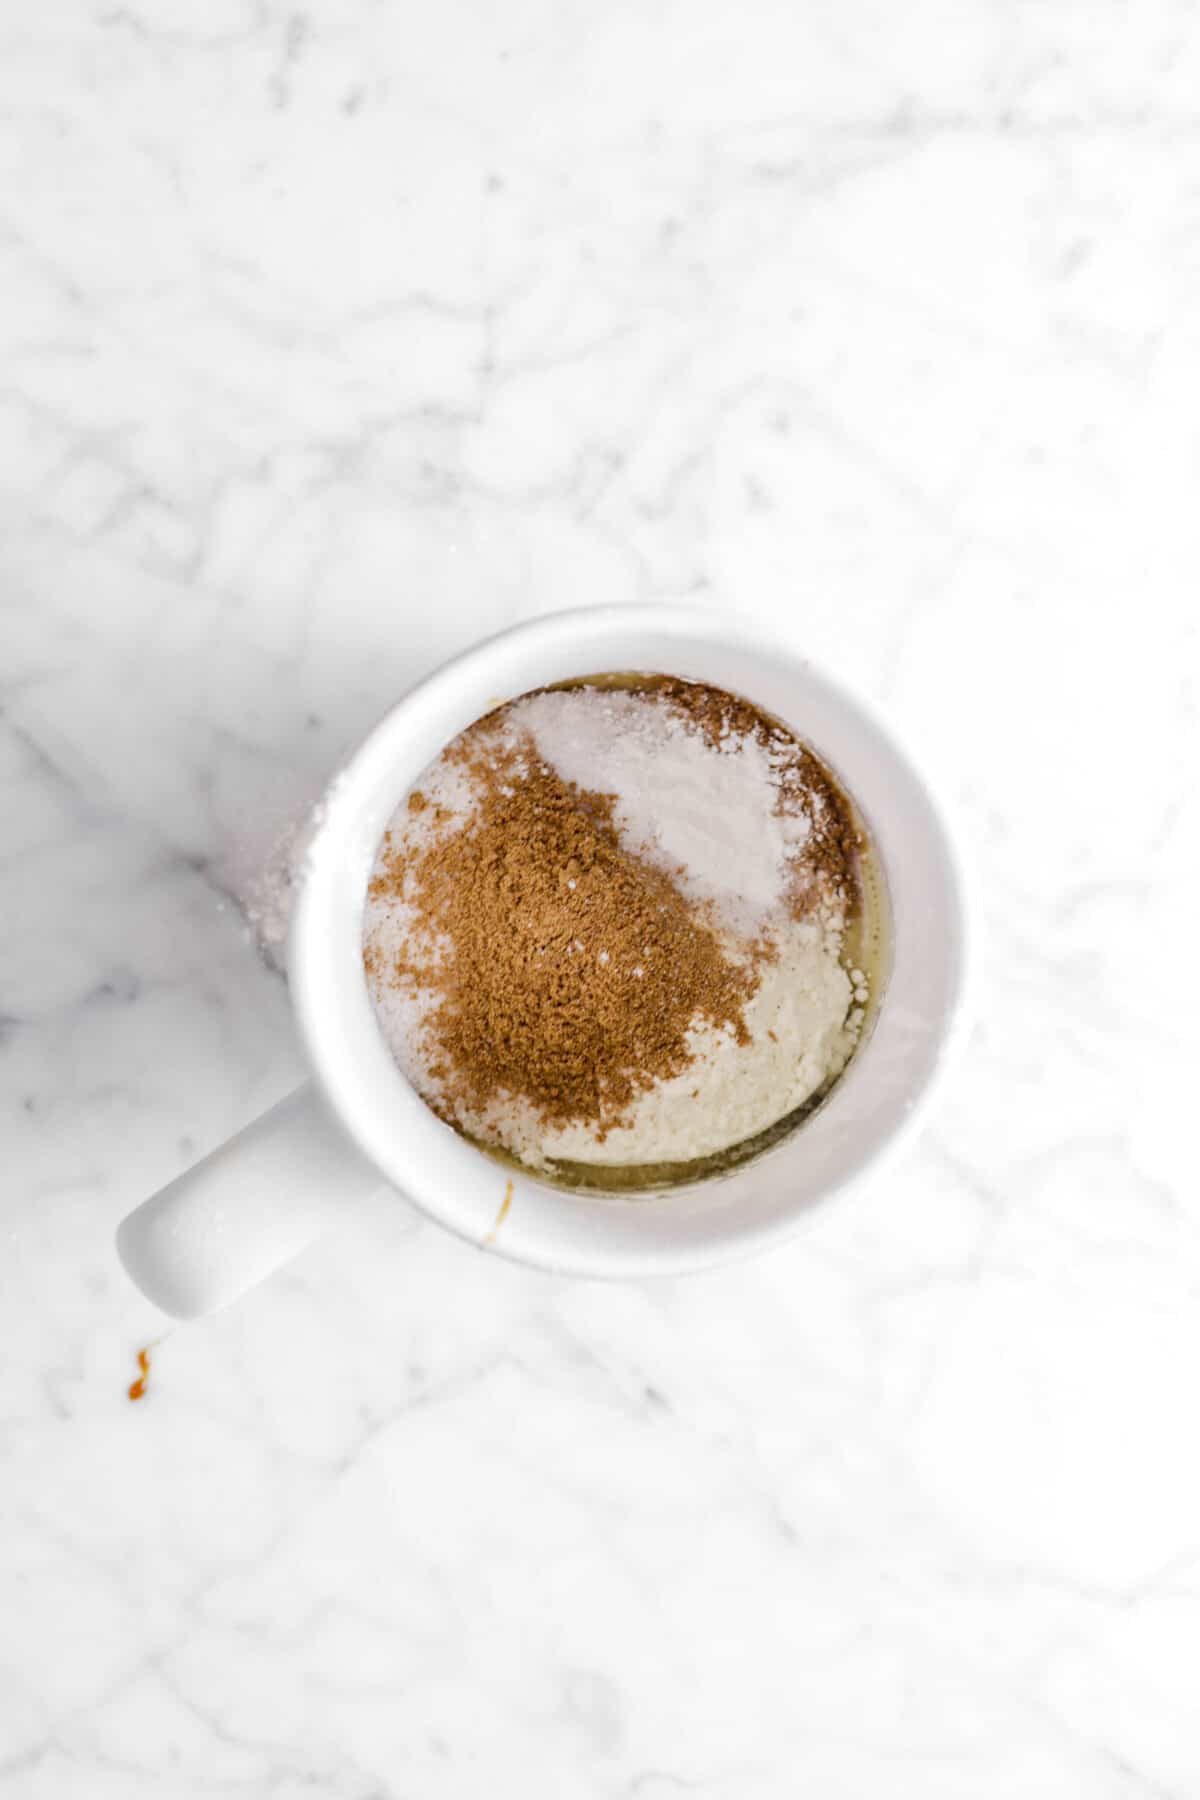 flour, baking powder, salt, and spice in mug